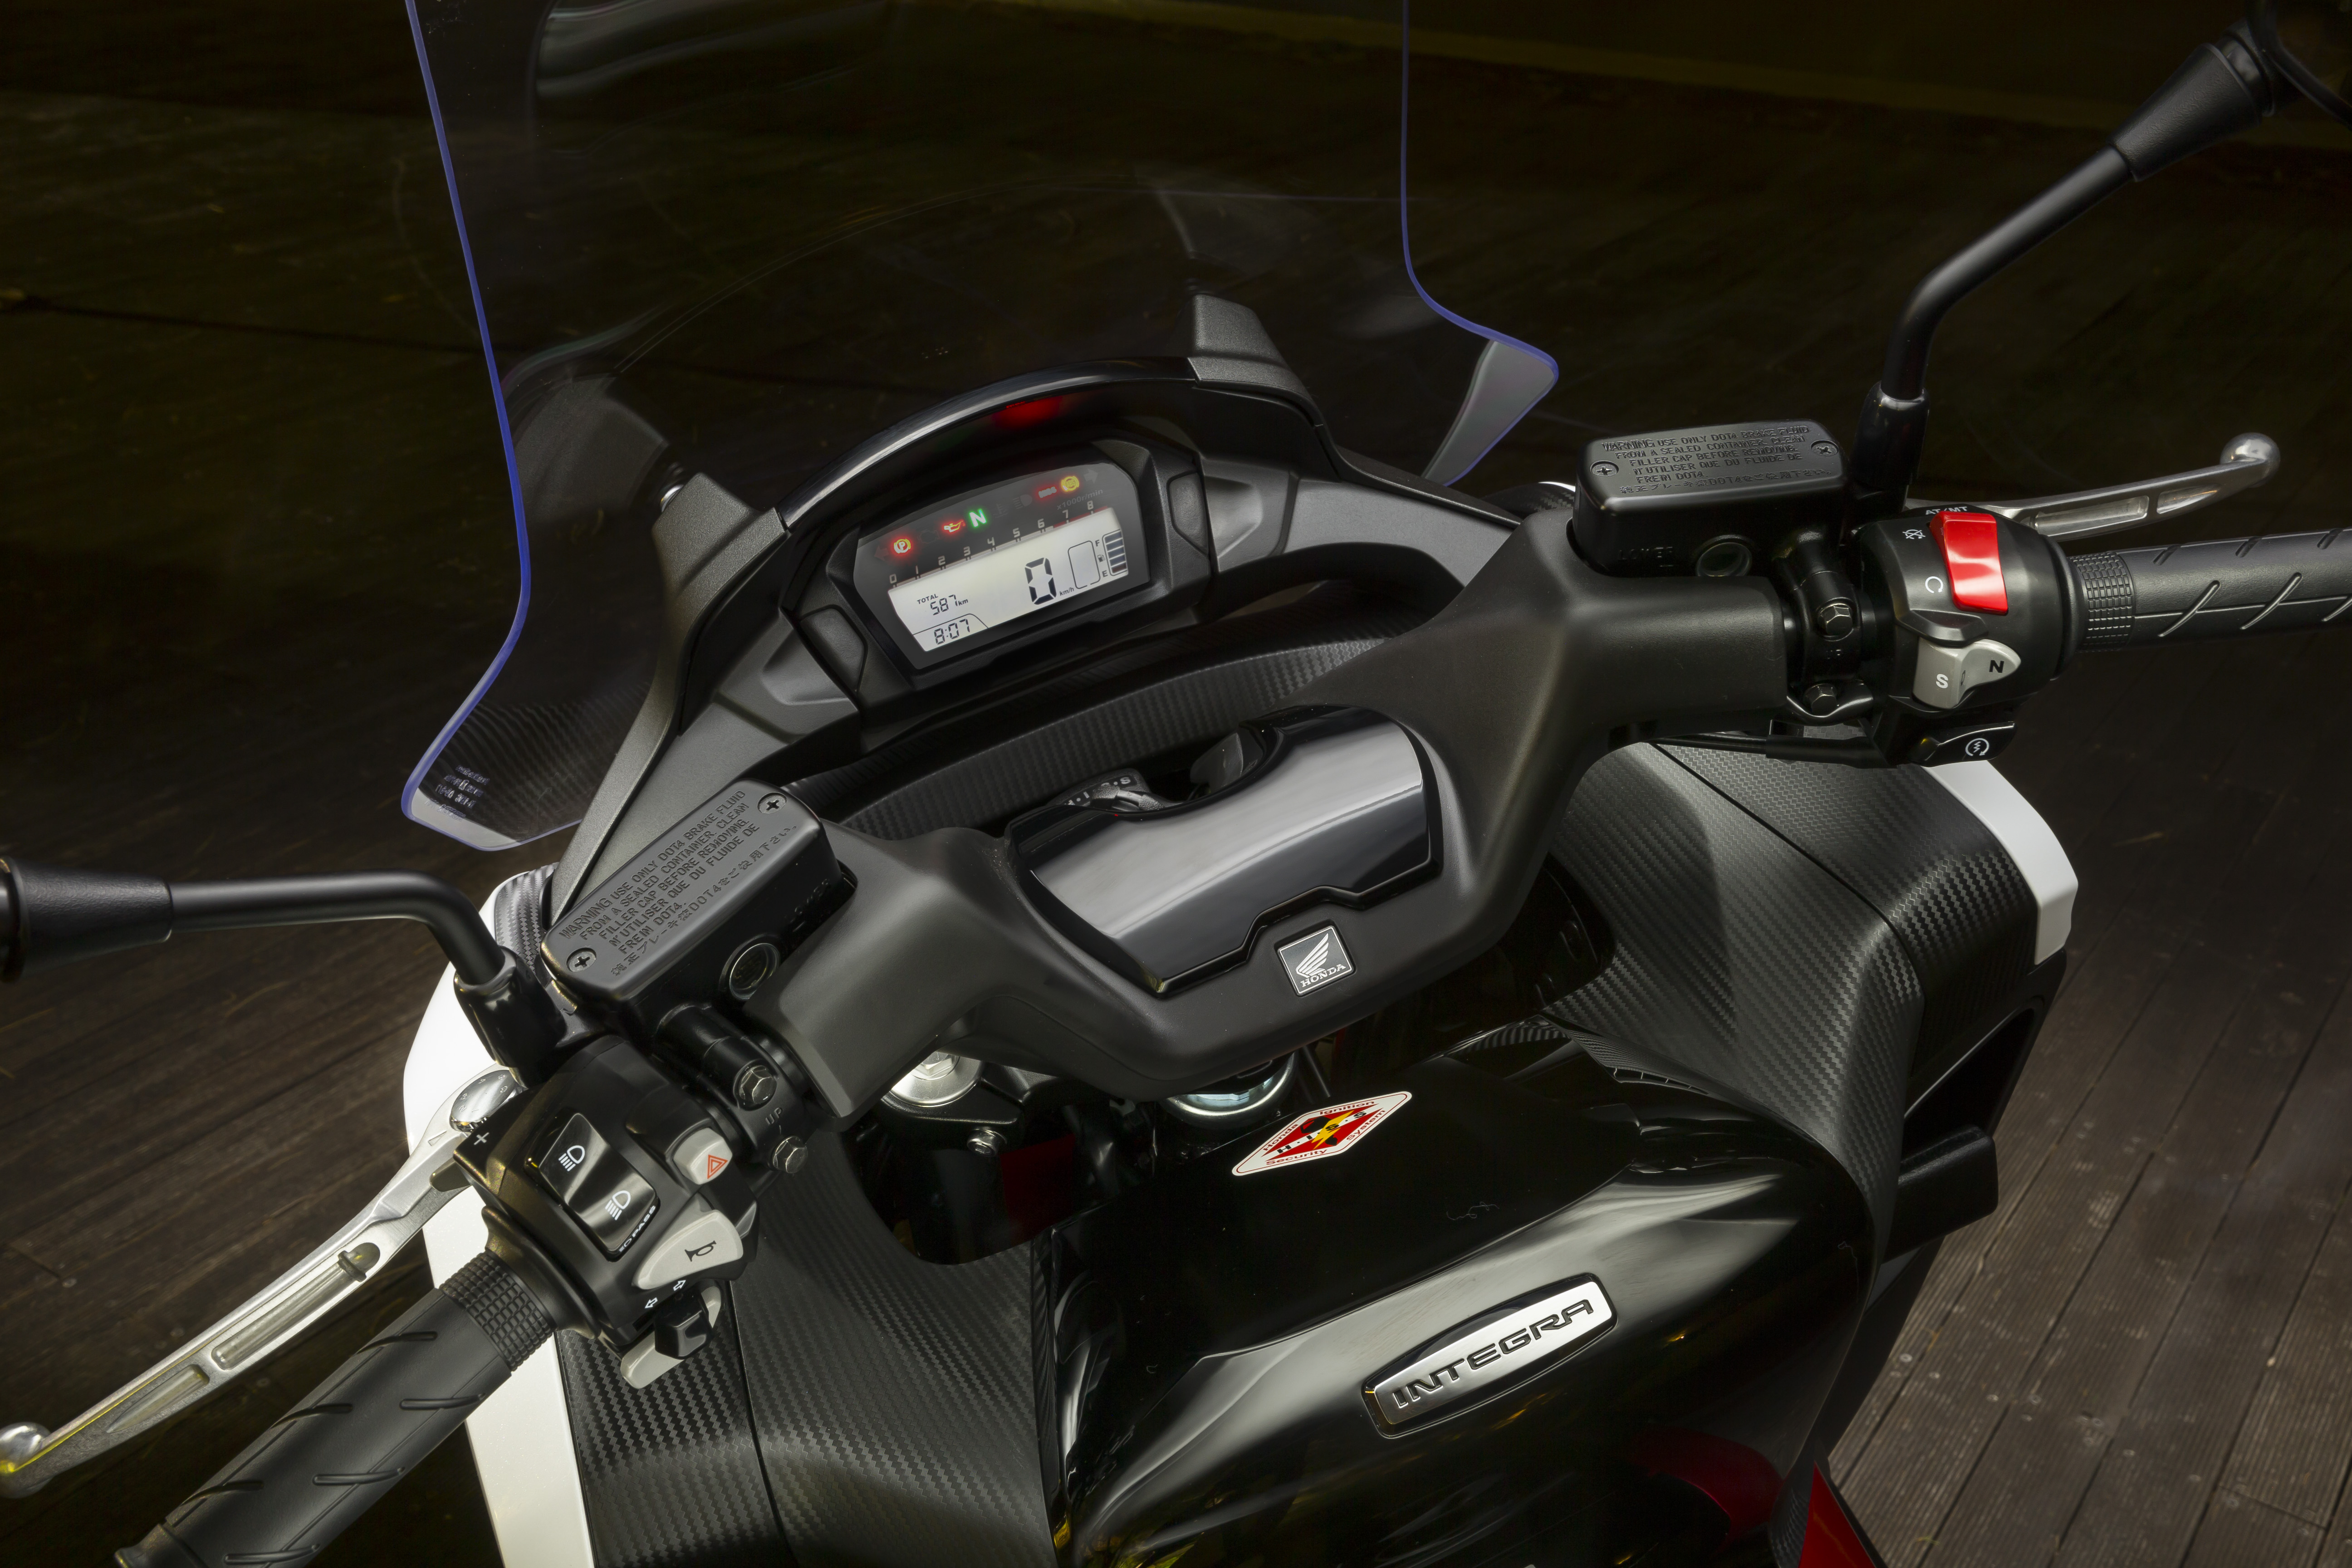 First ride: 2014 Honda Integra 750 review